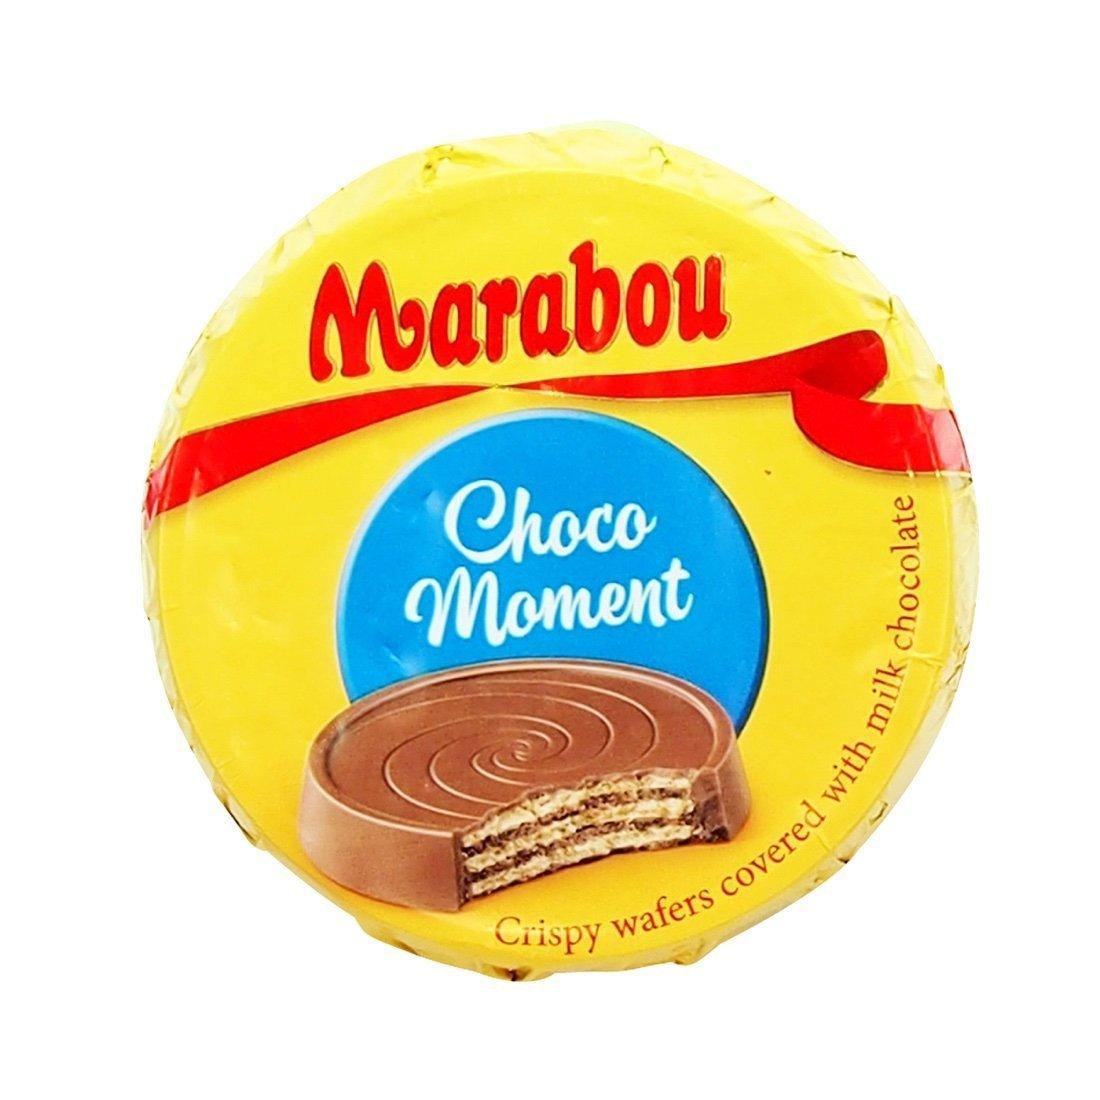 Marabou Choco Moment (30 g) 1